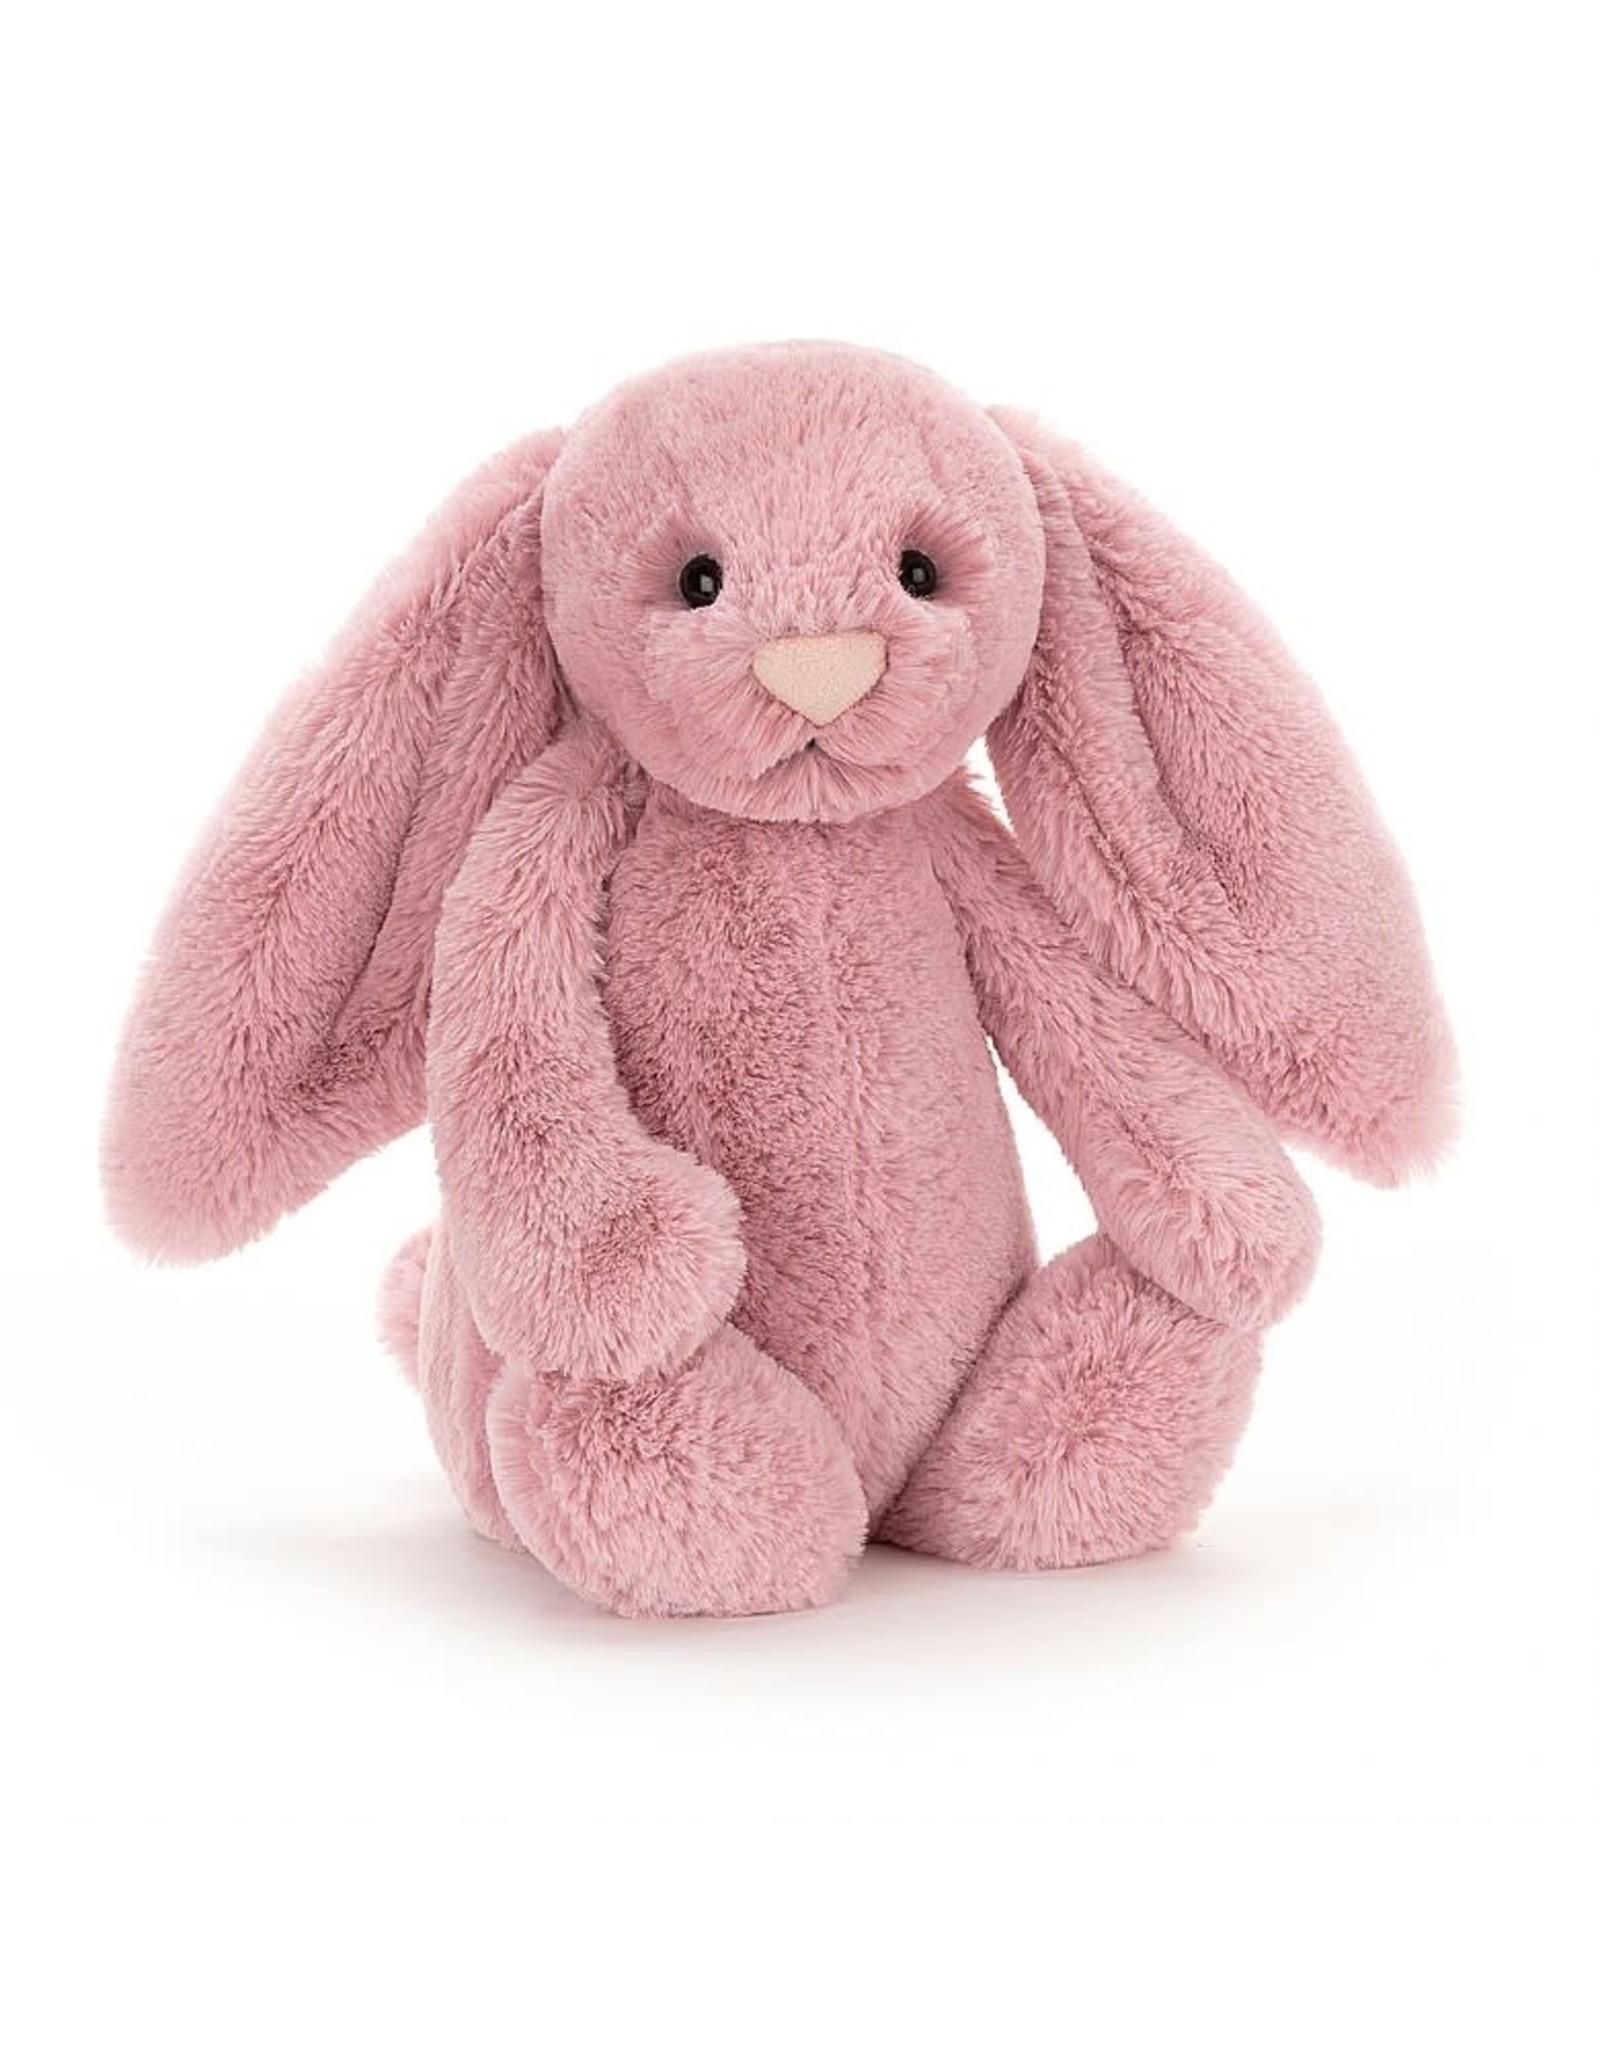 Jellycat JellyCat Medium Bashful Tulip Pink Bunny